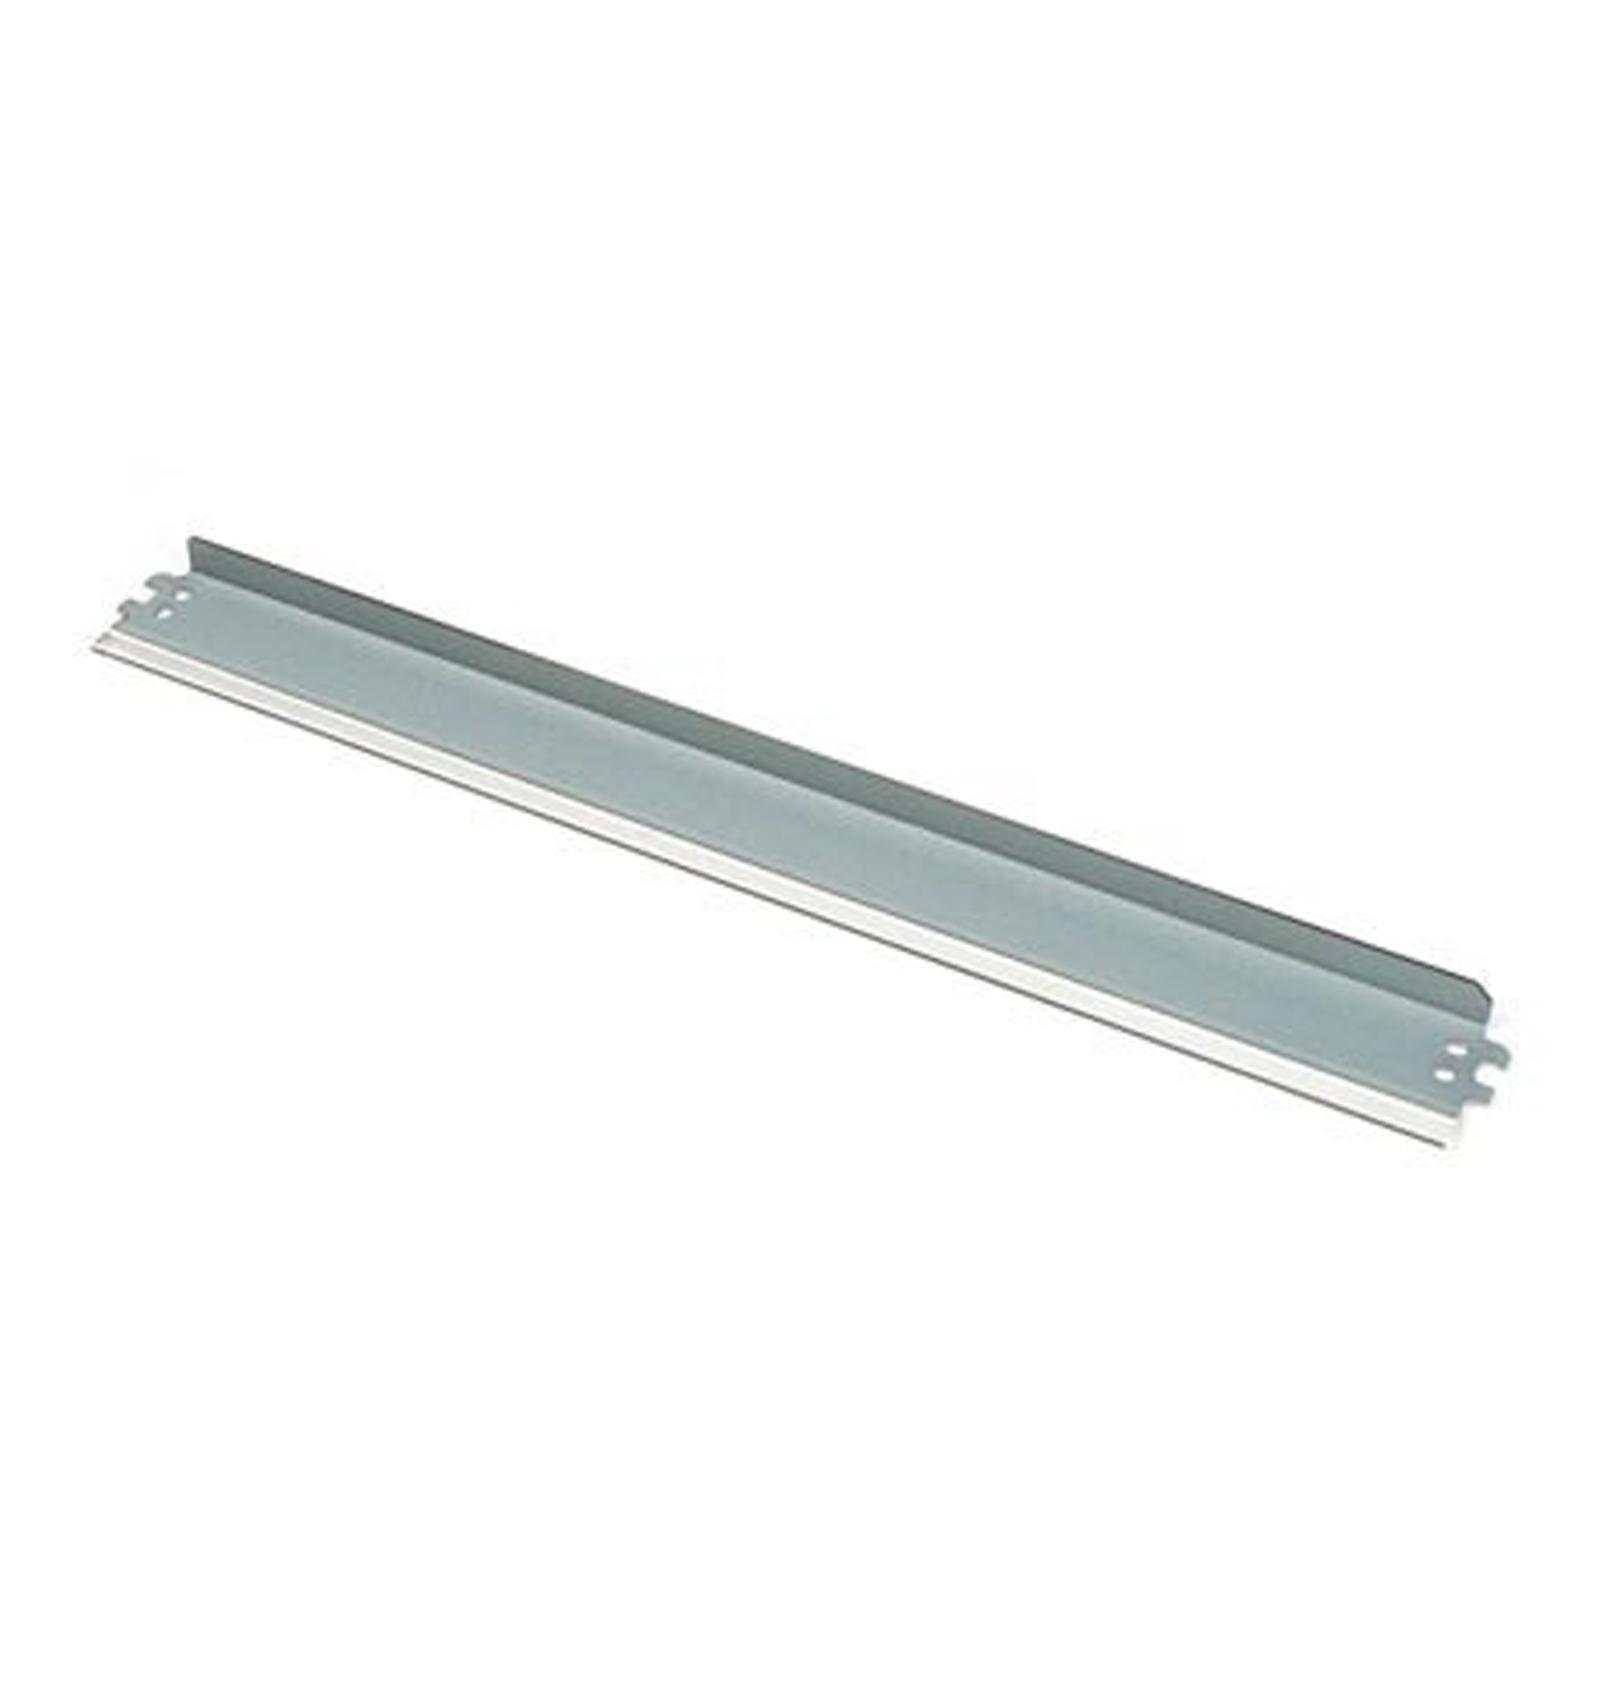 Замена ракеля картриджа HP CE505A/X (05A/X) для LaserJet P2035/P2055/P2055dn